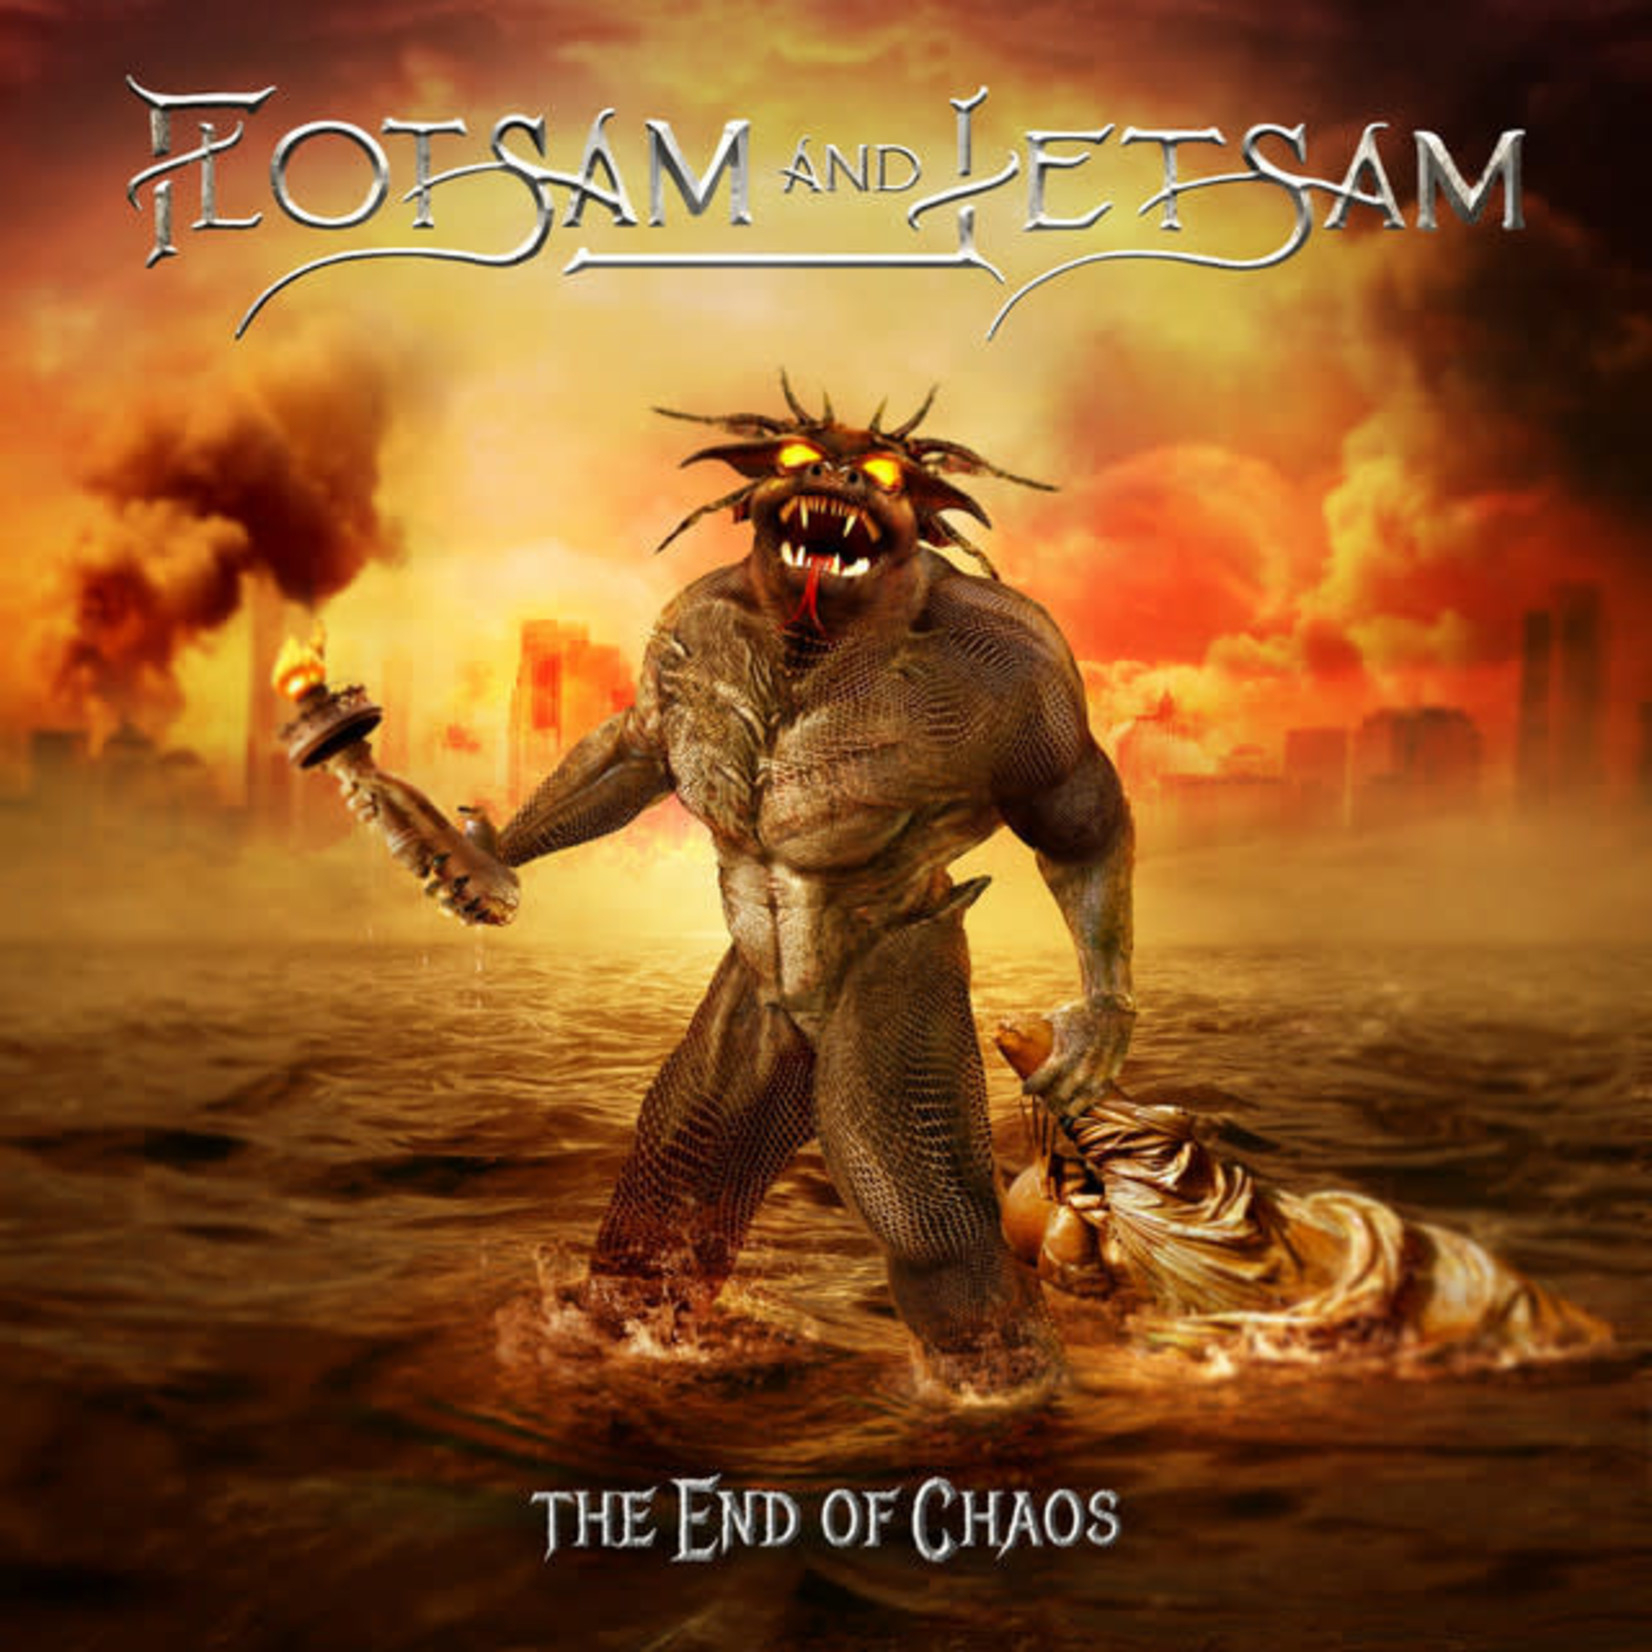 Vinyl Flotsam and Jetsam - The End Of Chaos. $20